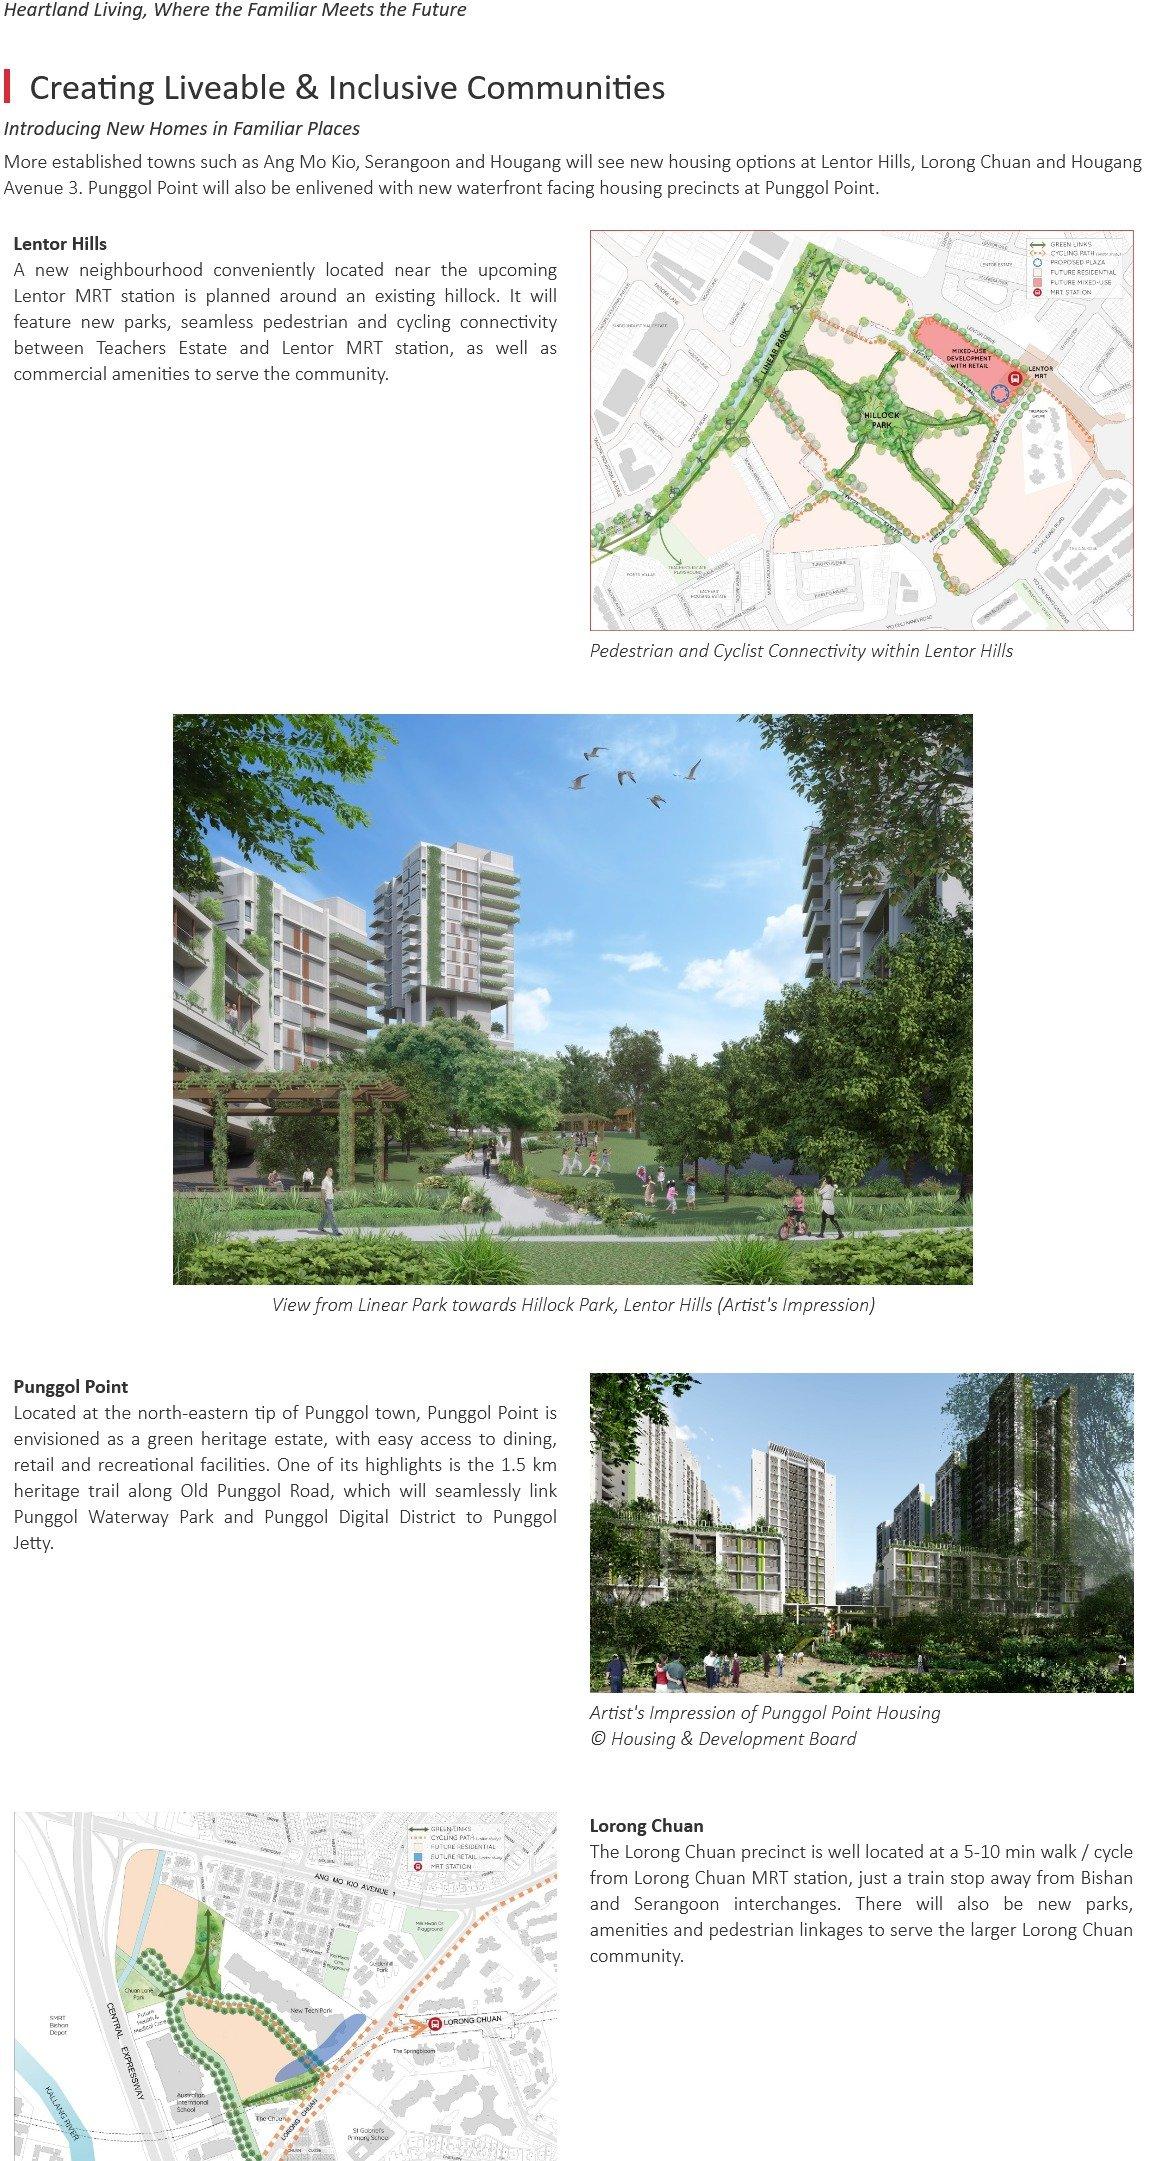 URA Master Plan - North-East Region, where the familiar meets the future 7